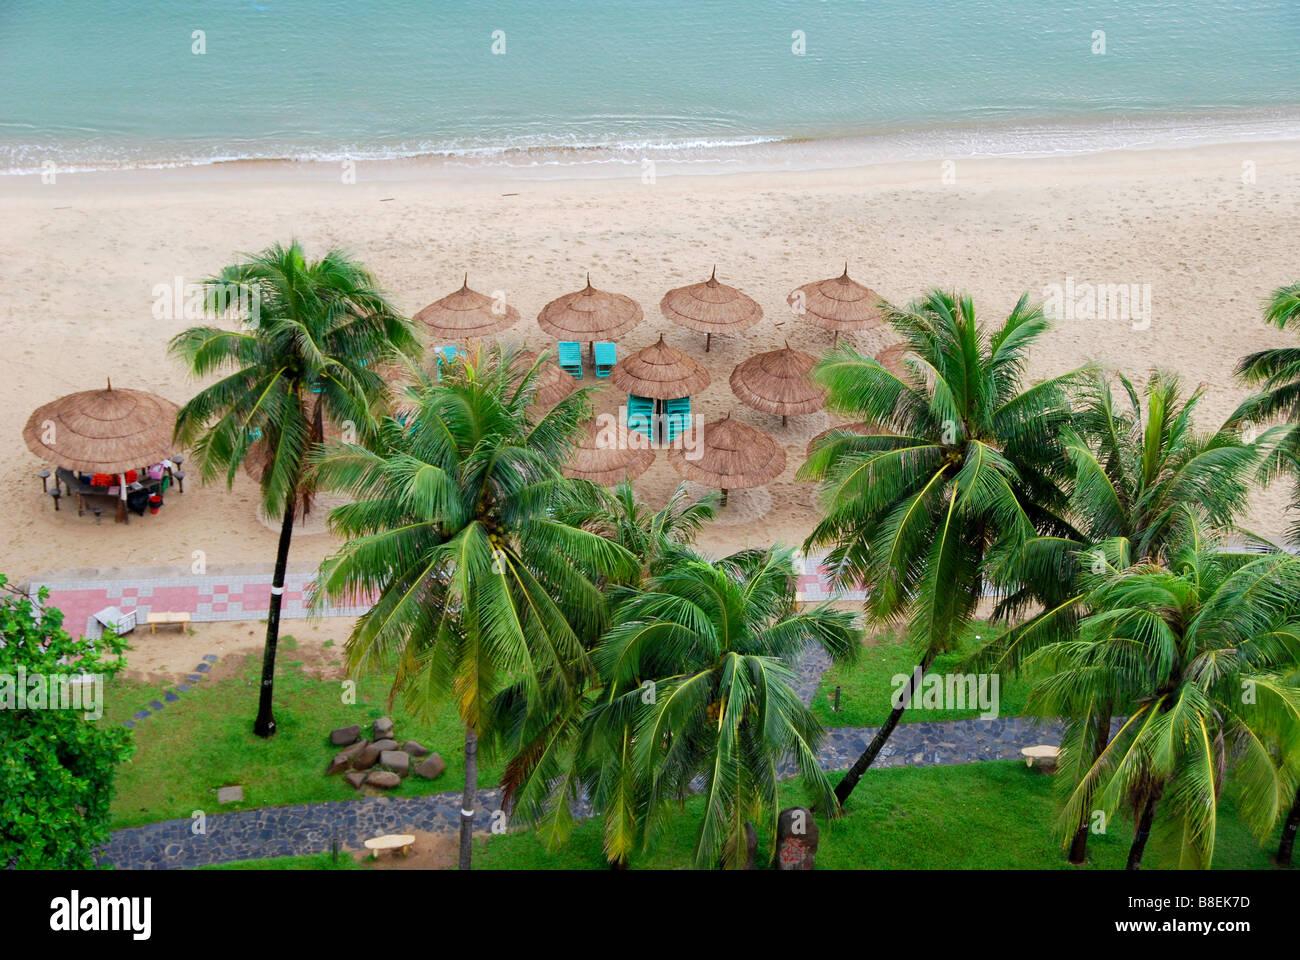 Straw Beach umbrellas, Nha Trang, Vietnam - Stock Image